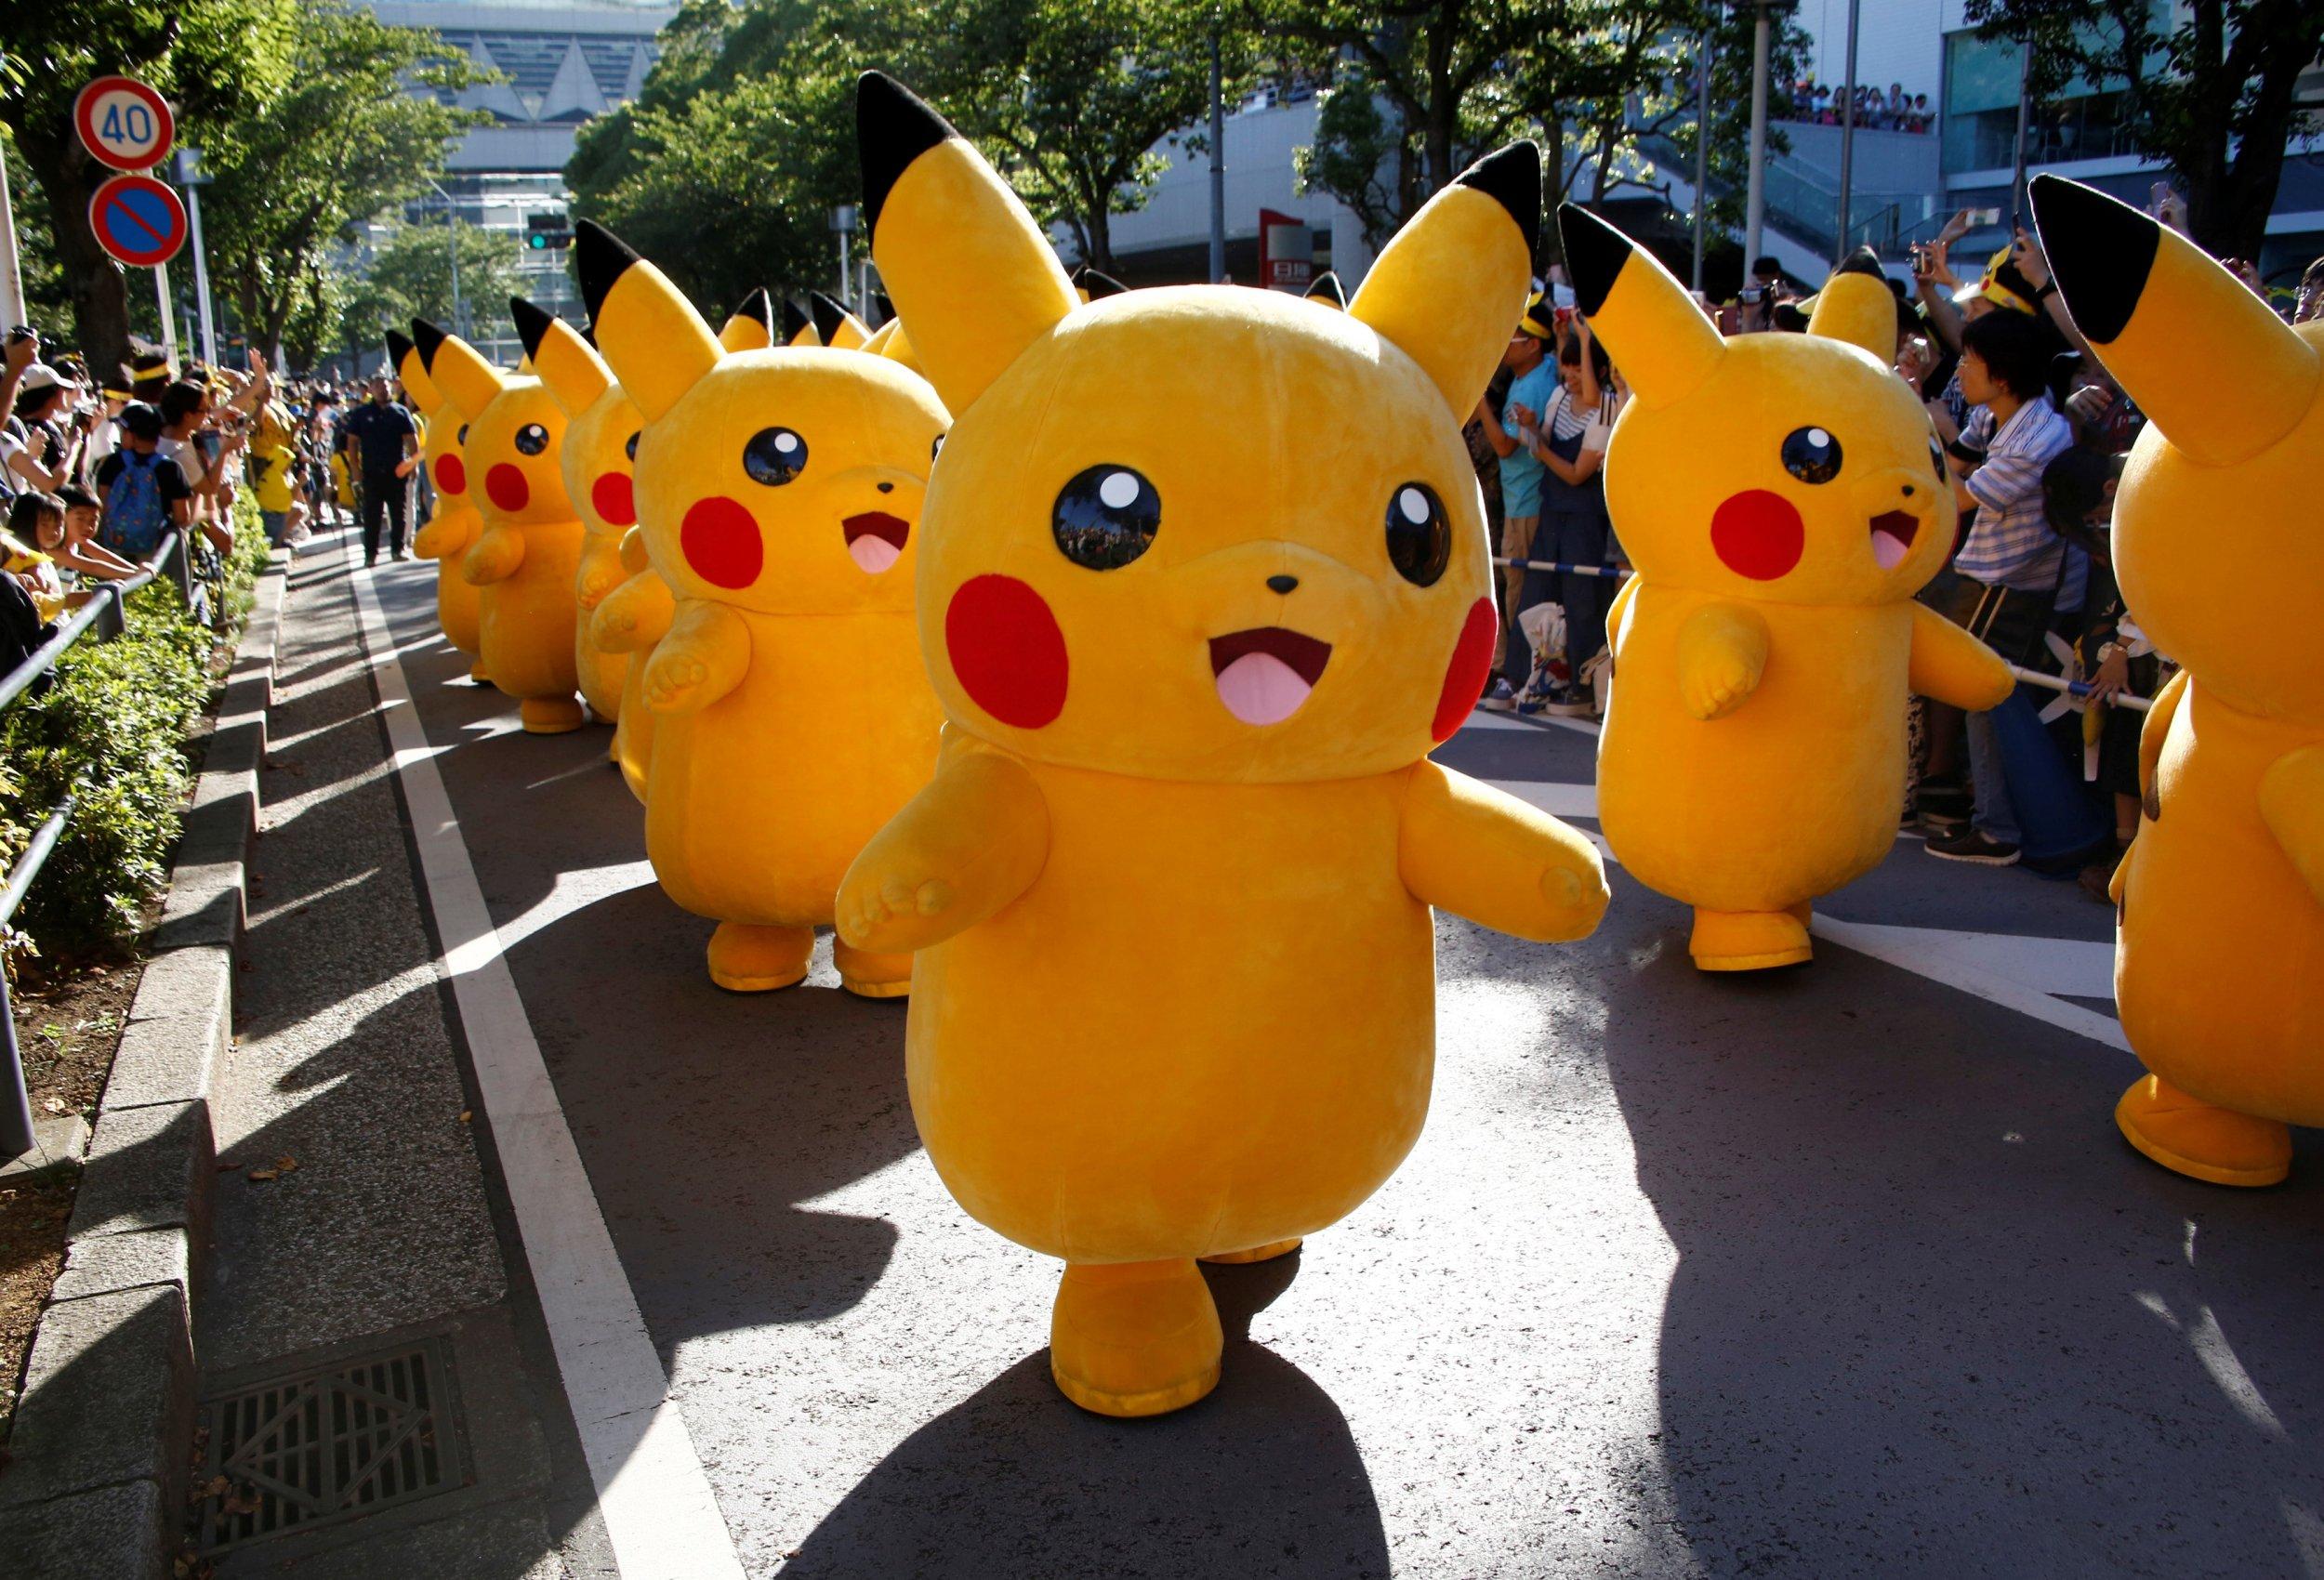 11_29_Pikachu